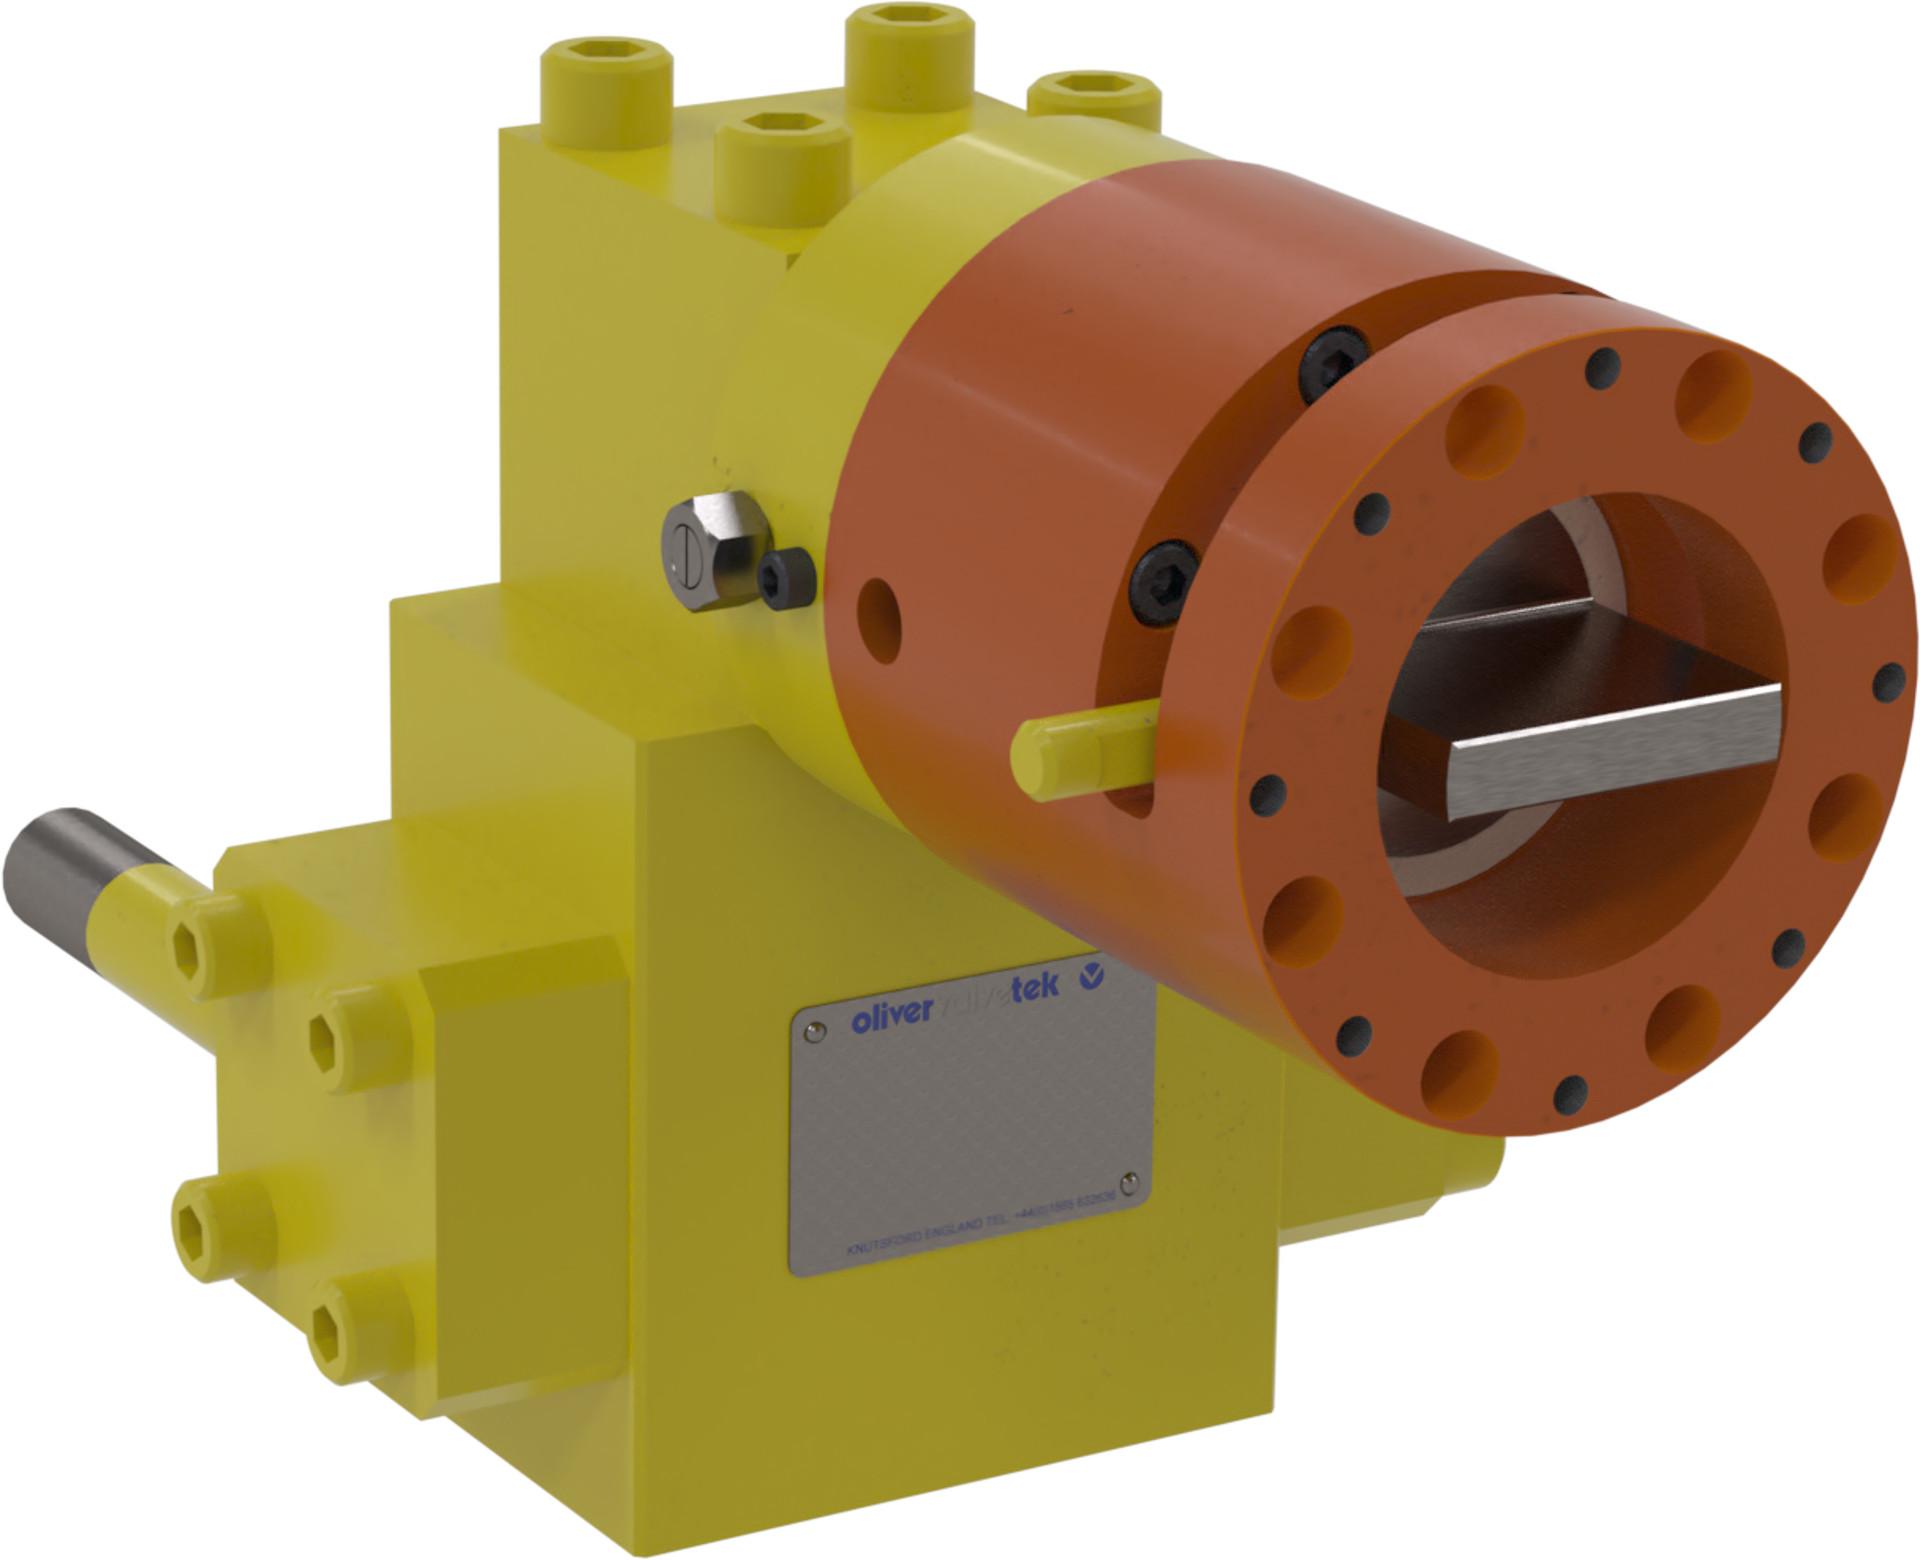 Subsea ballgate valves Oliver Valvetek kuleventil Subsea manifold offshore Subsea Distributr Norge Norway